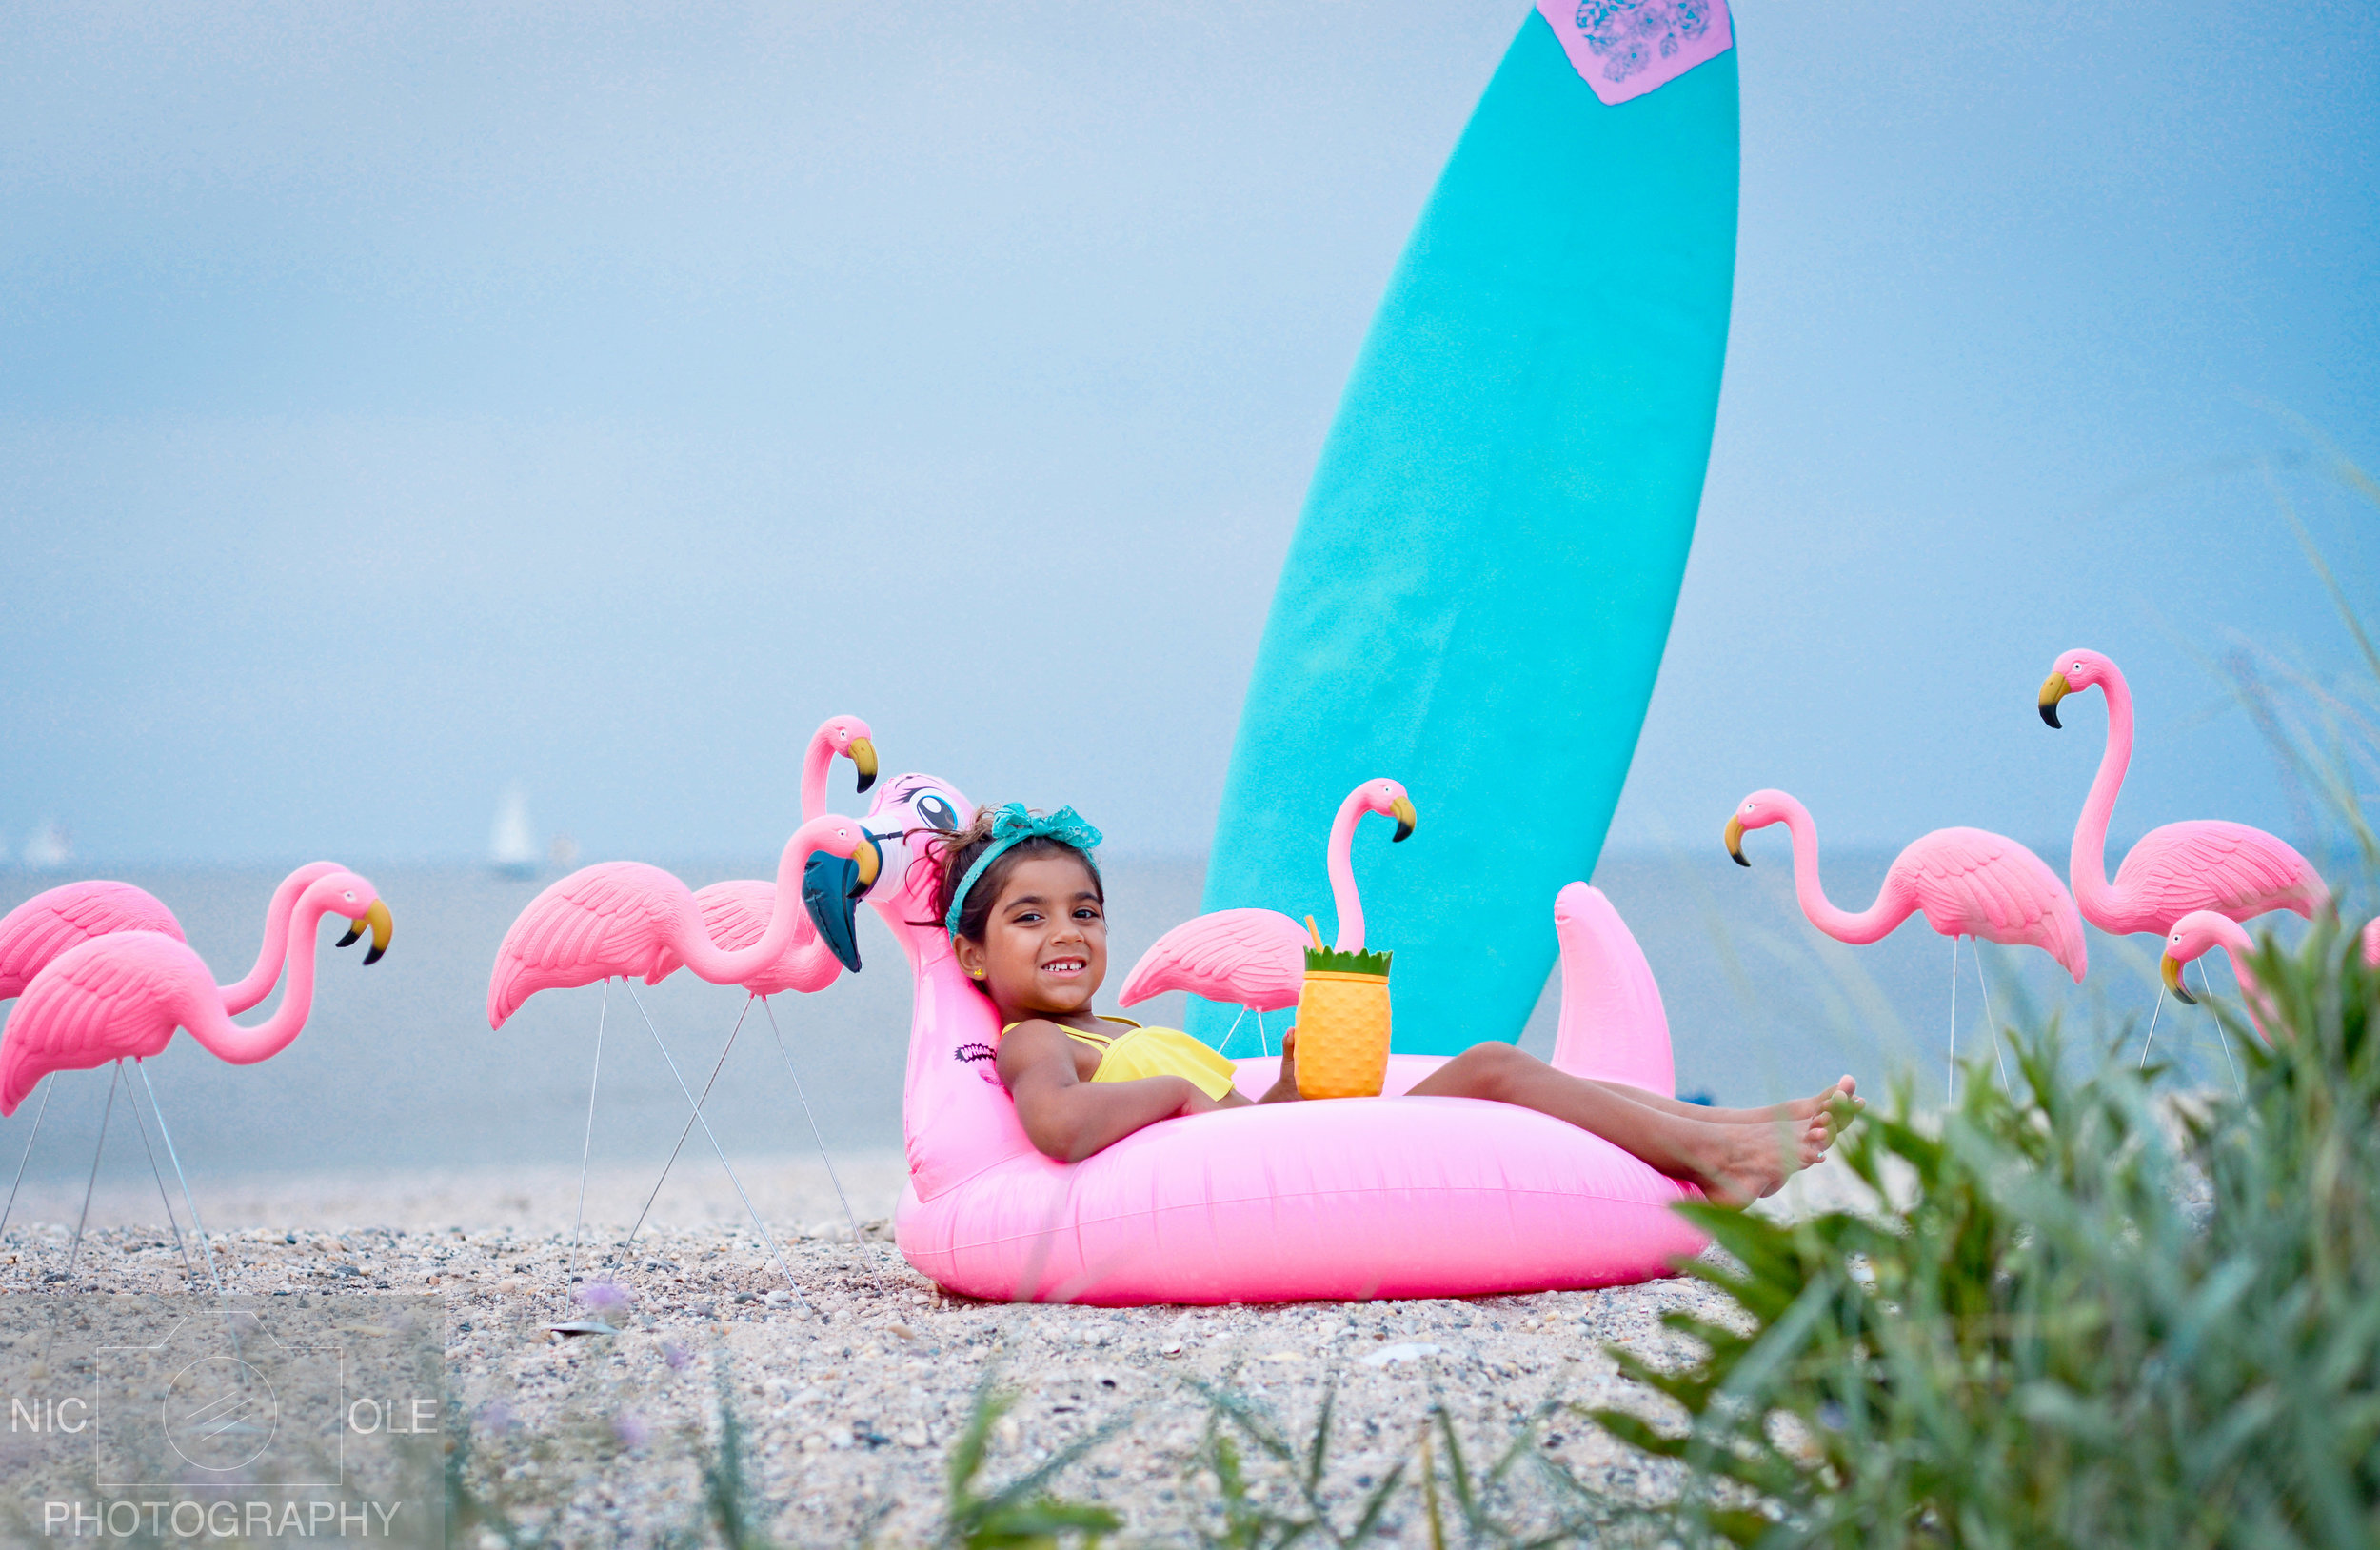 Cielo Noemi Flamingo Beach 7.20.17- NIC-OLE Photography-8.jpg